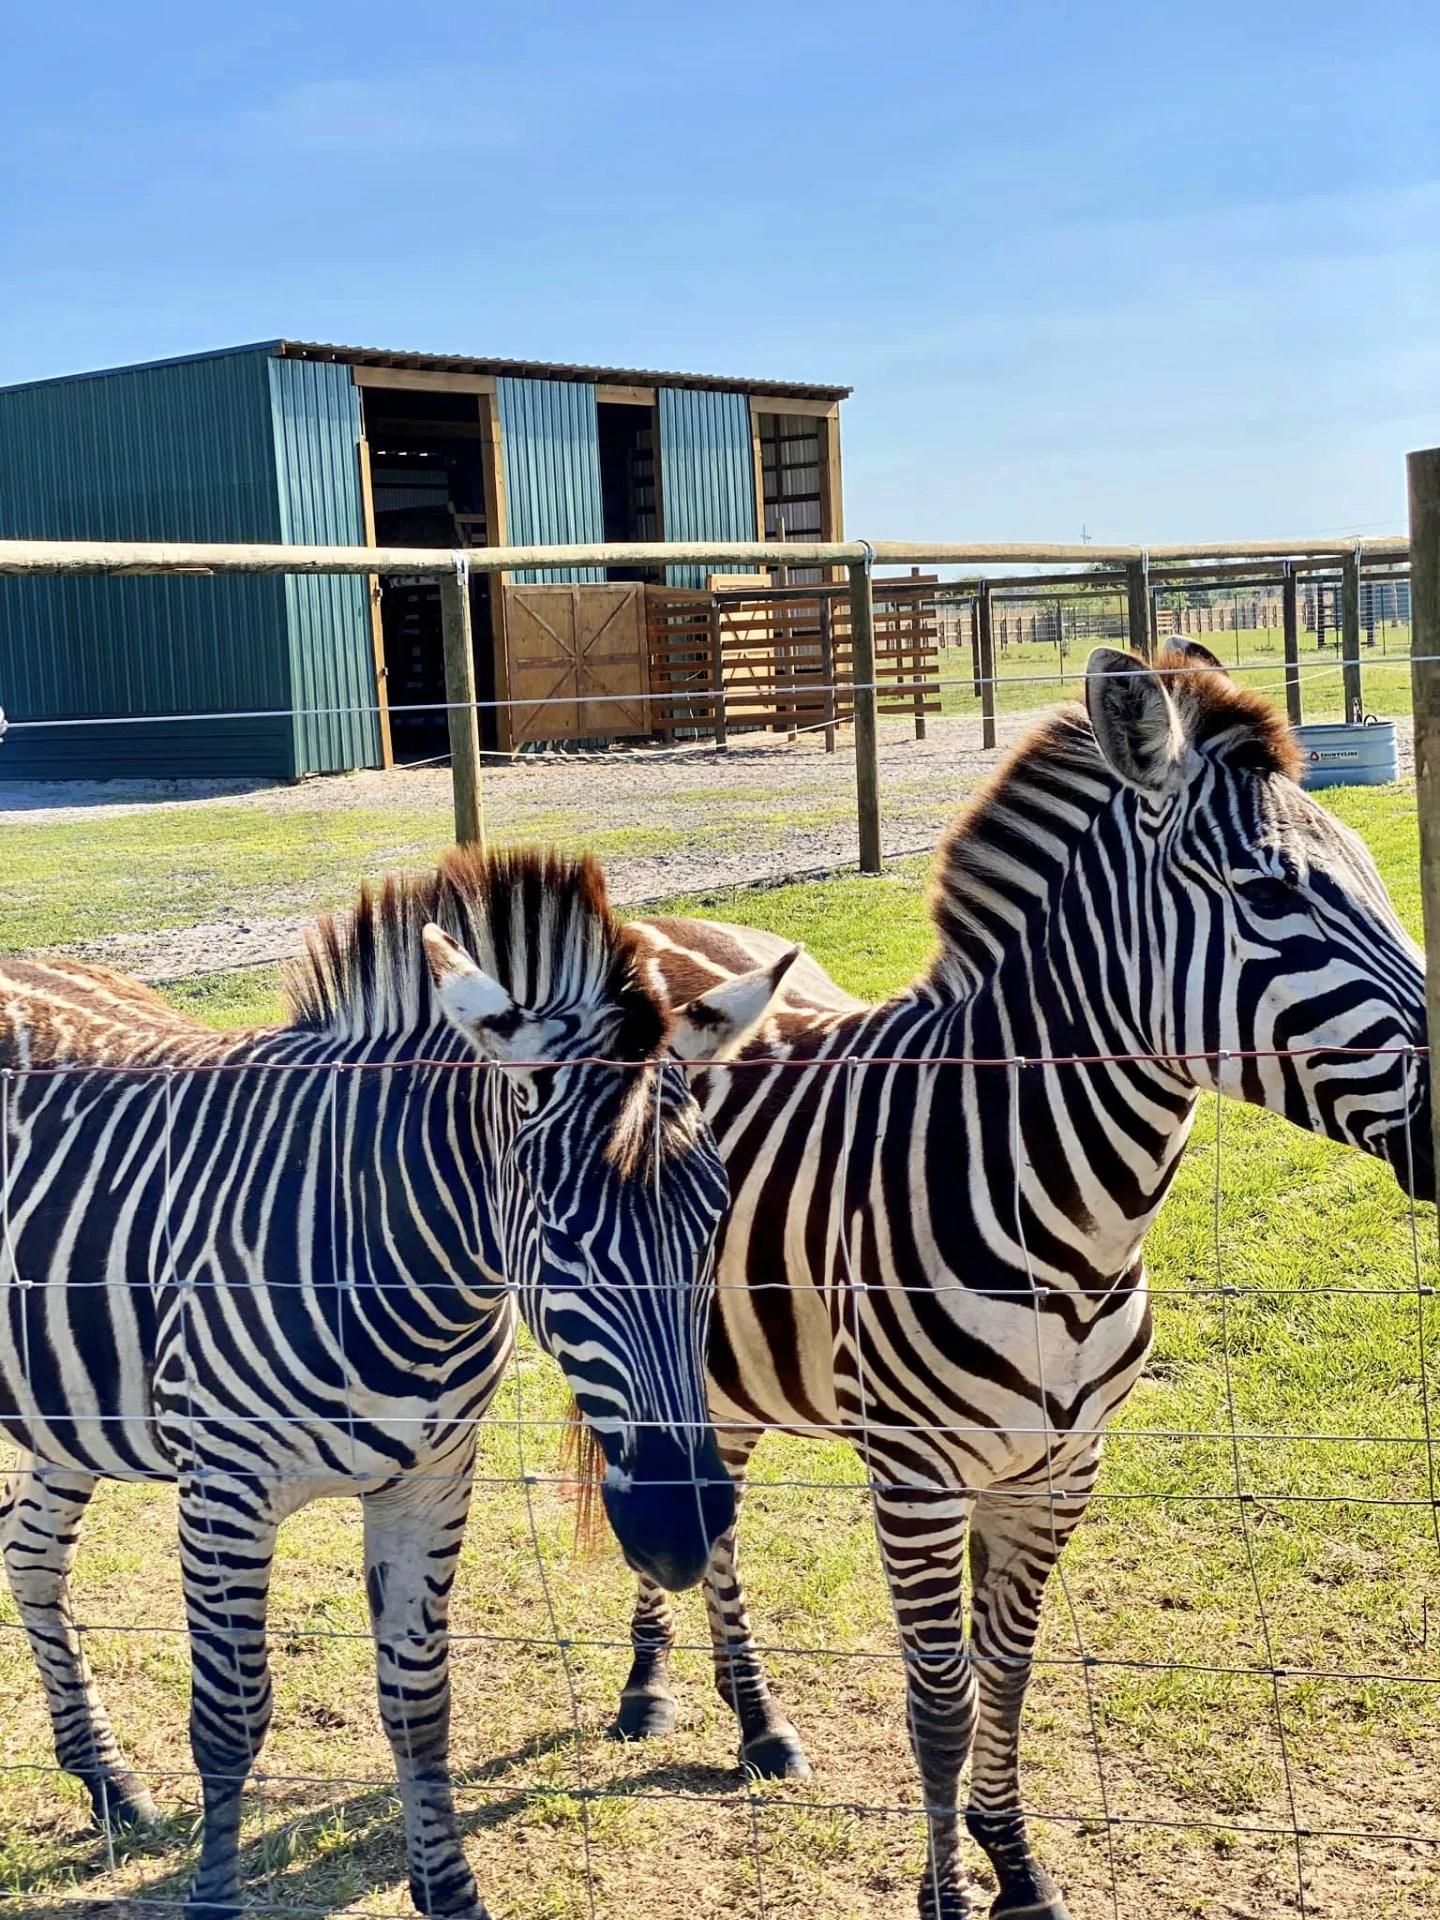 Zebra behind a fence at Wild Florida Drive-Thru Safari Park